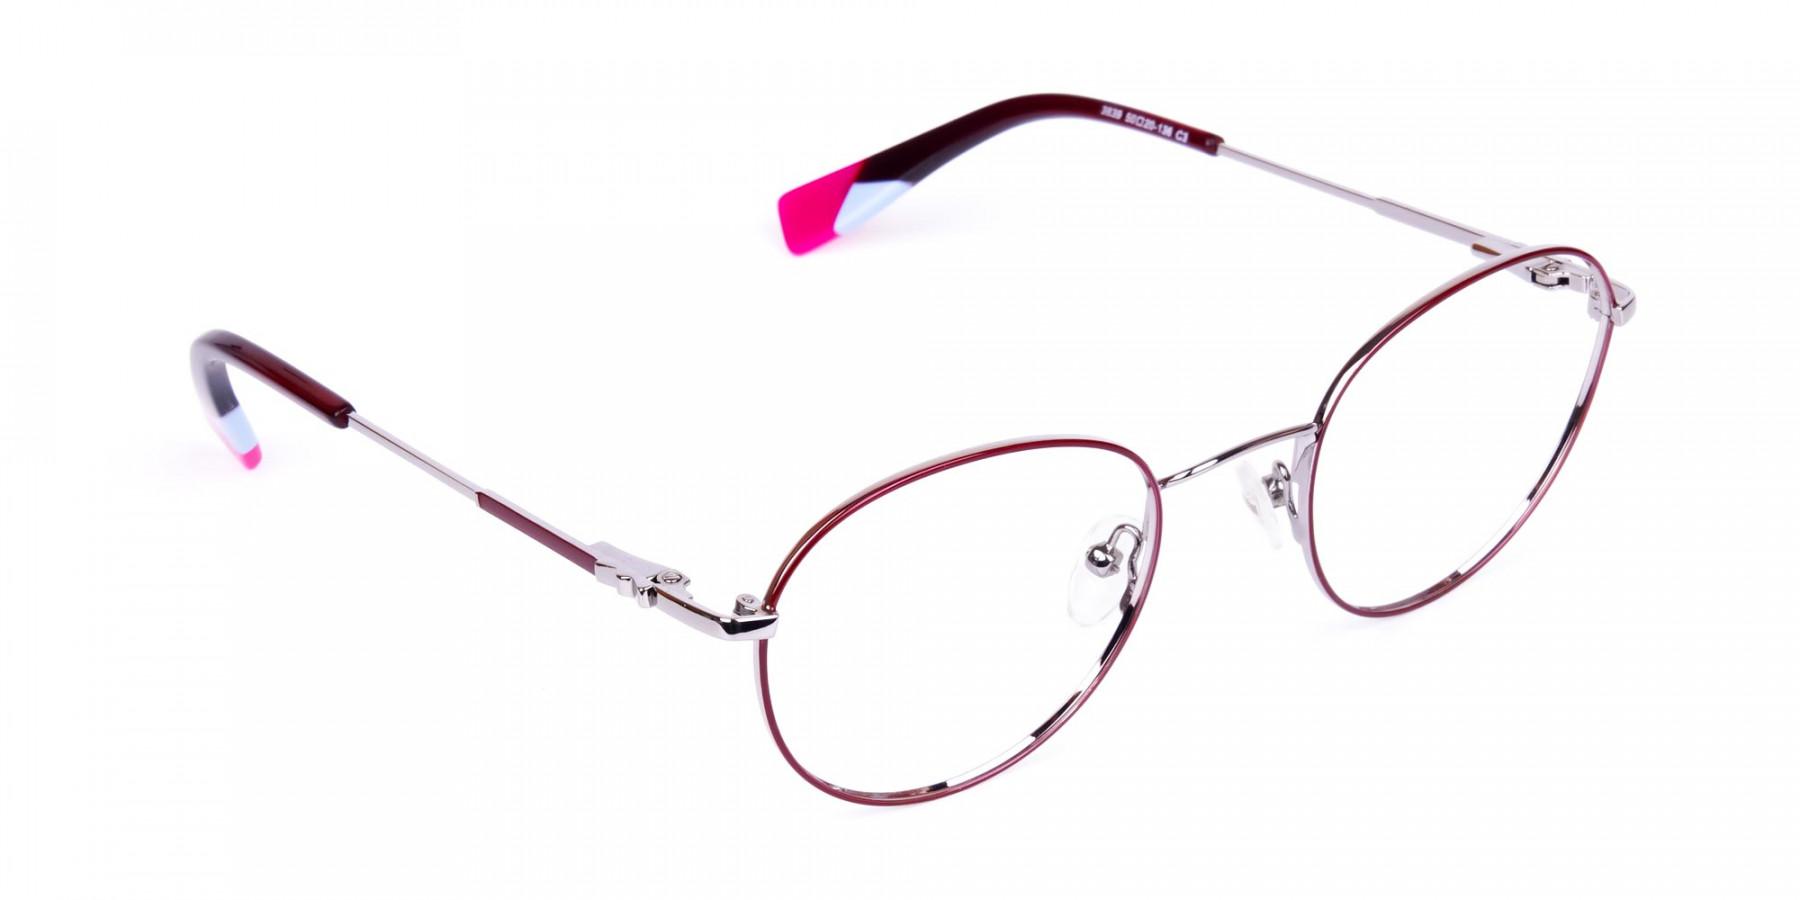 Stylish-Burgundy-and-Silver-Round-Glasses-1